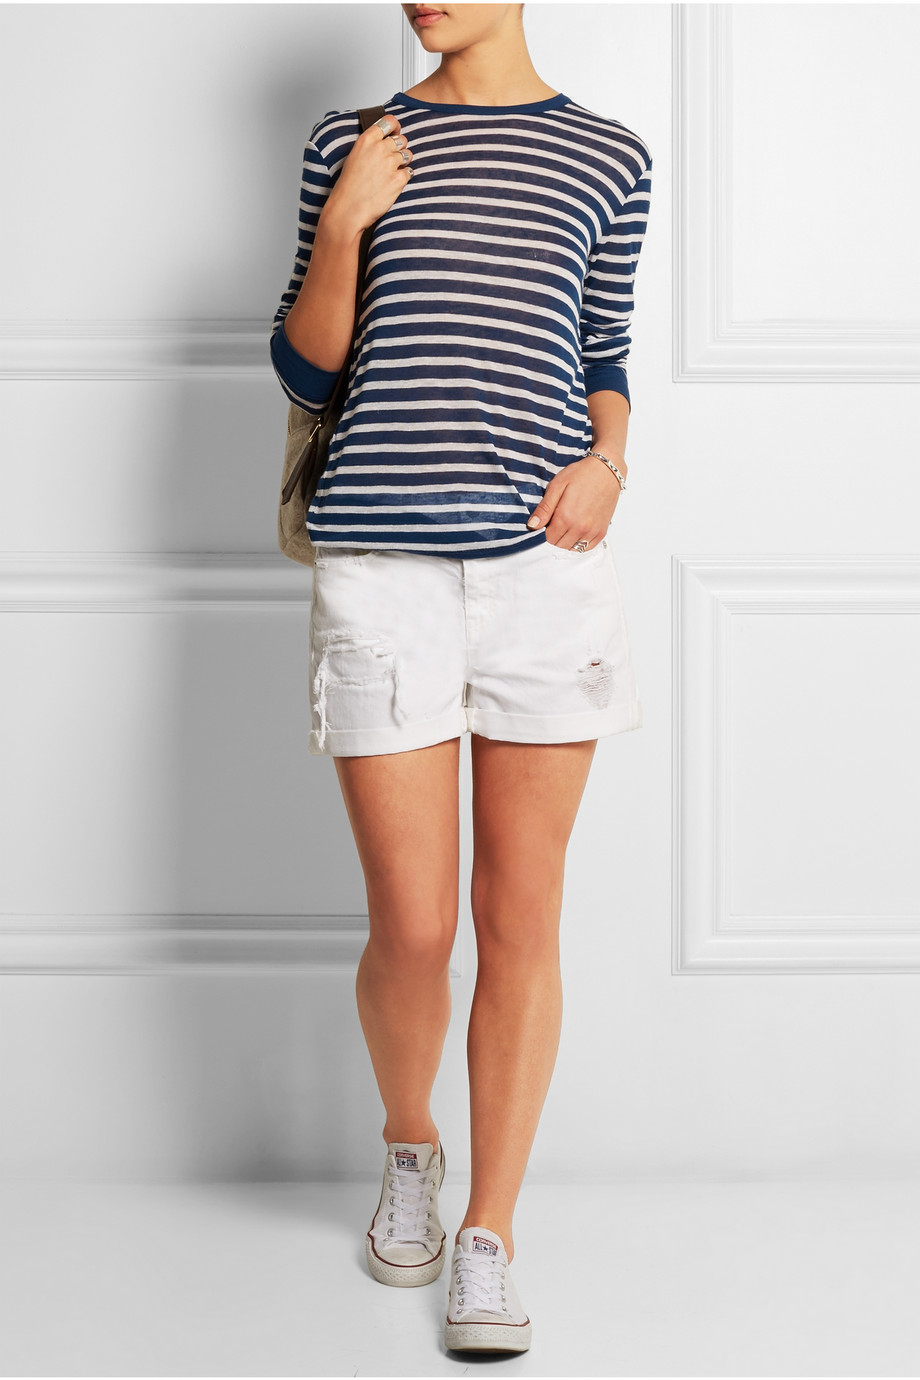 Madewell Distressed Denim Boyfriend Shorts in White | Lyst